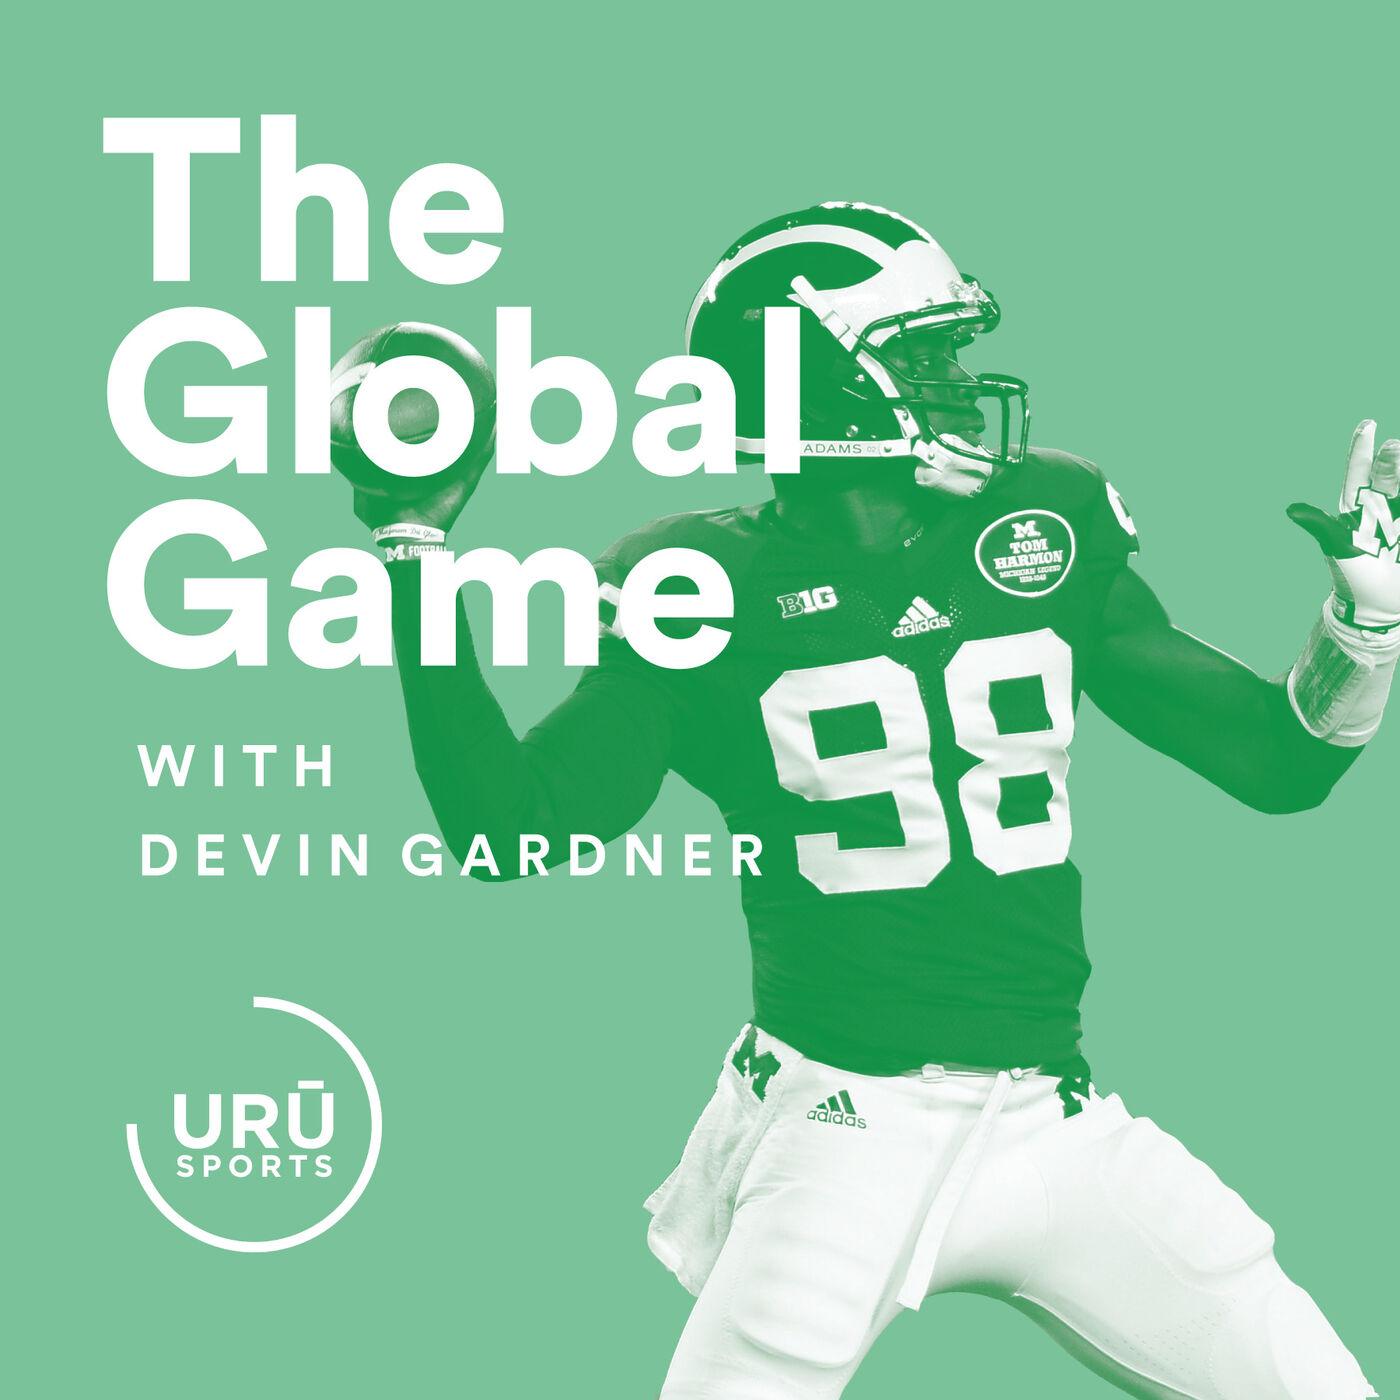 Devin Gardner | Football in Japan?